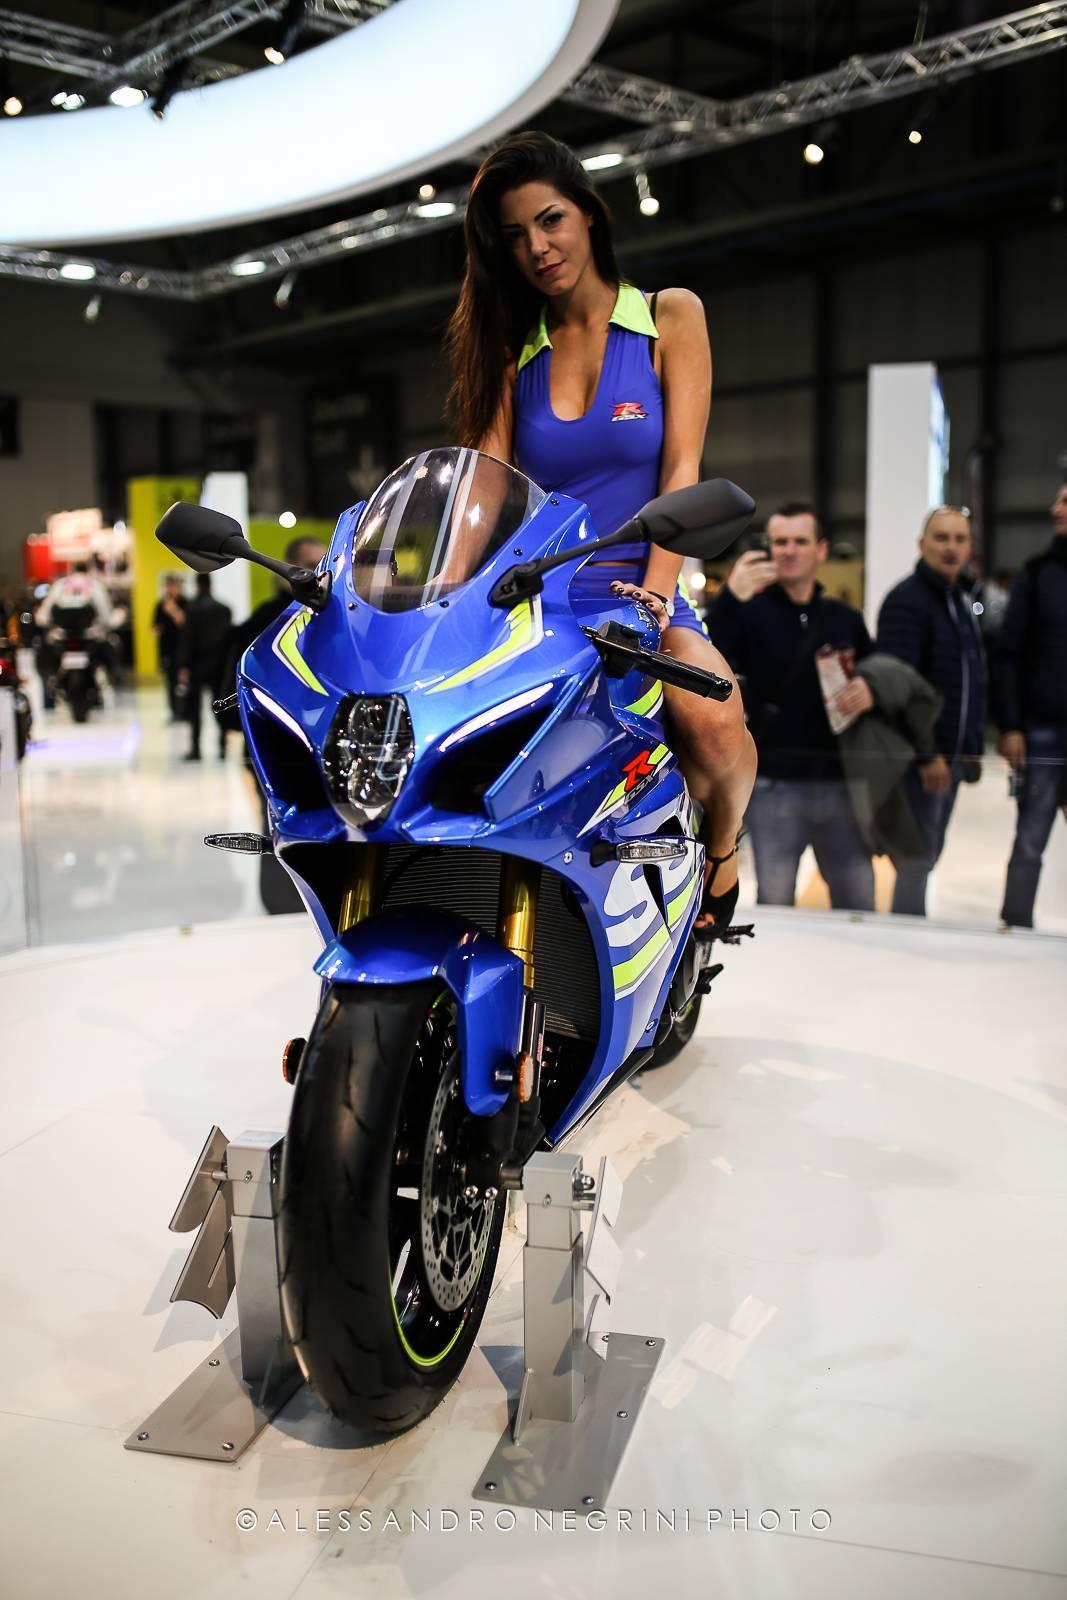 Eicma Milan Motorcycle Show 2015 Highlights Gtspirit